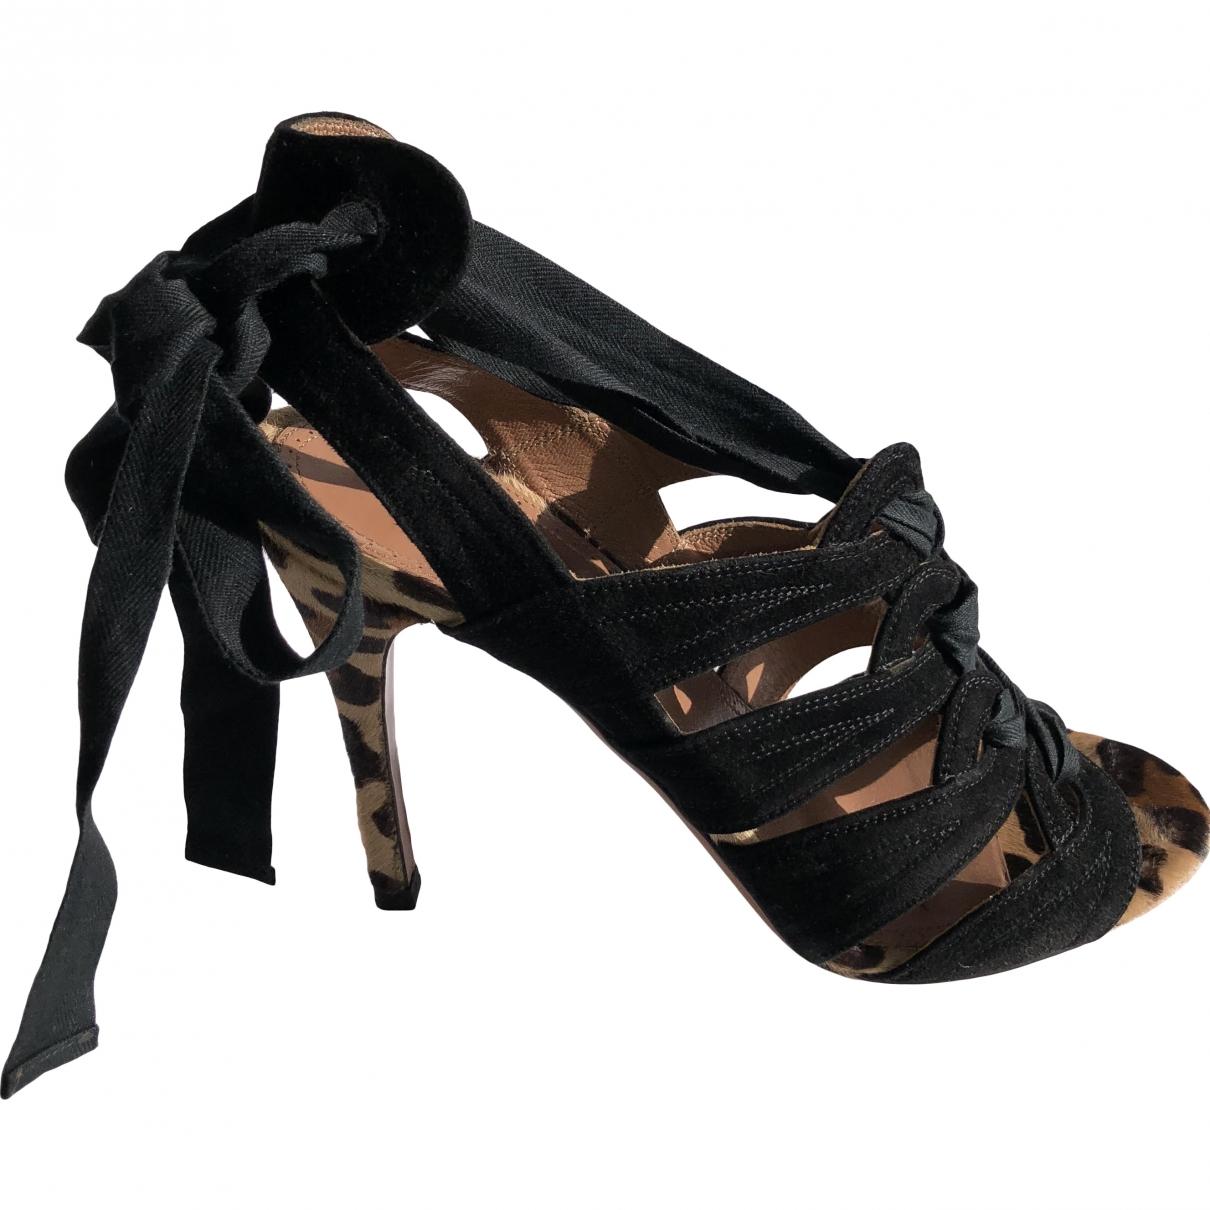 Alaïa \N Black Pony-style calfskin Sandals for Women 39 EU